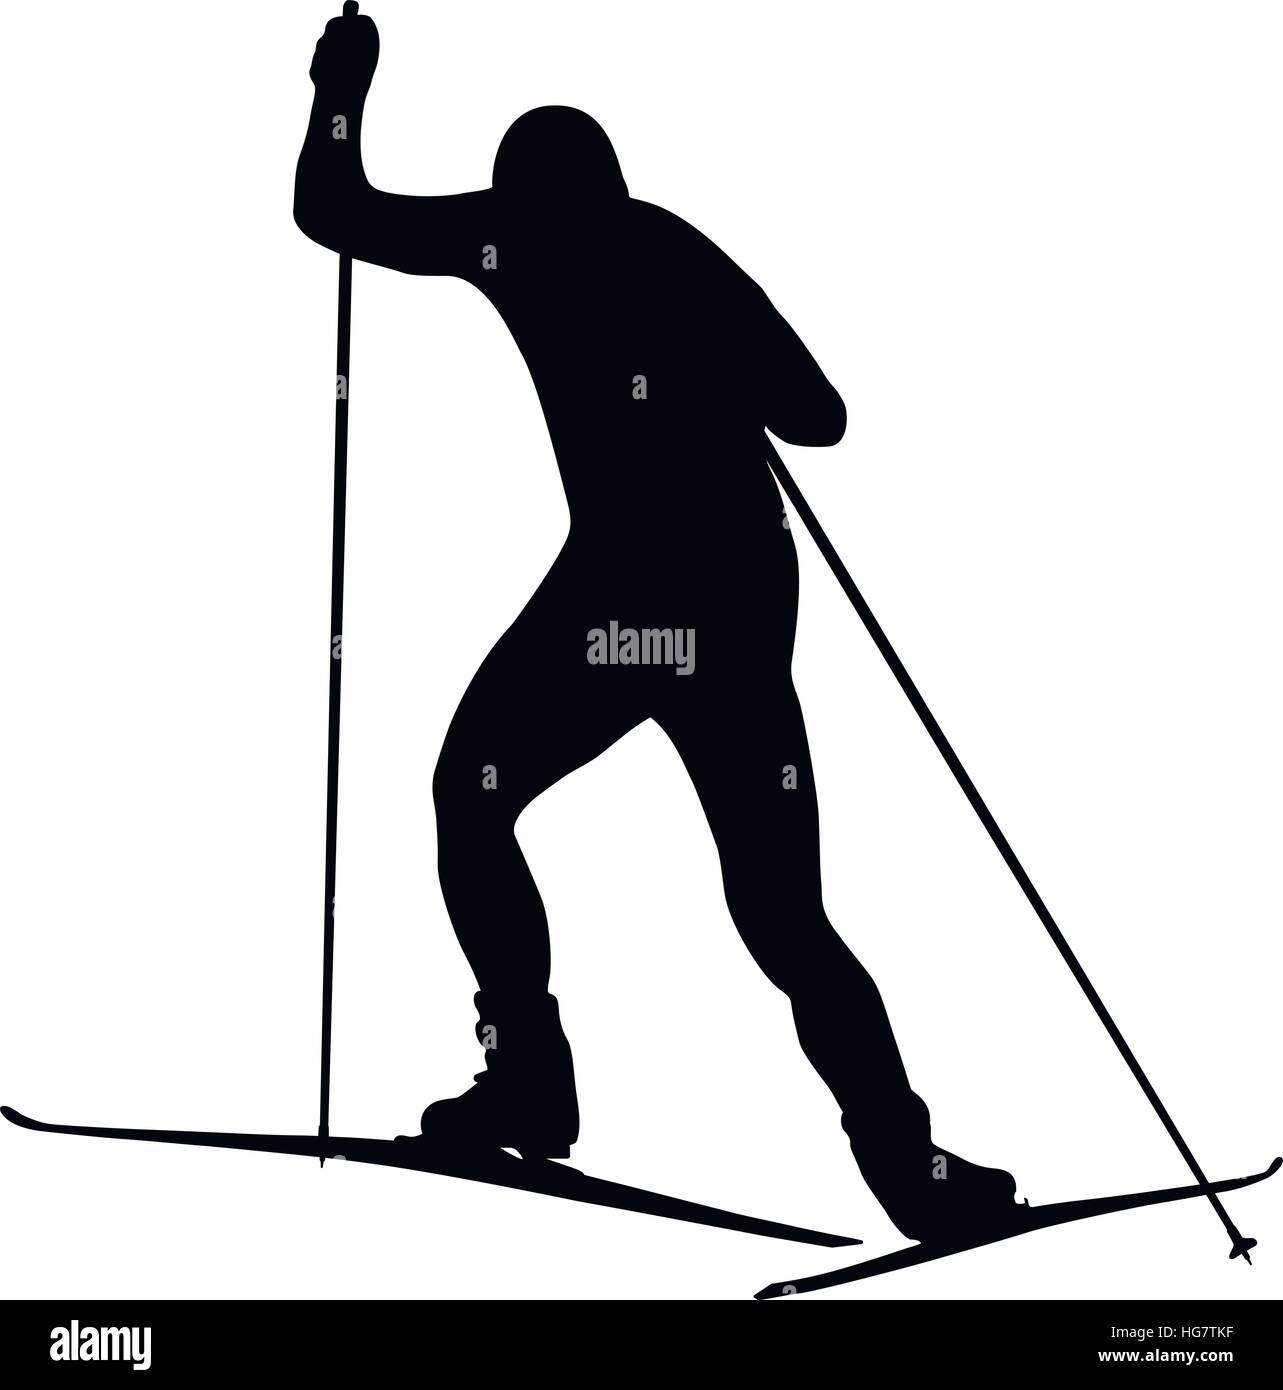 man athlete skier freestyle black silhouette - Stock Vector